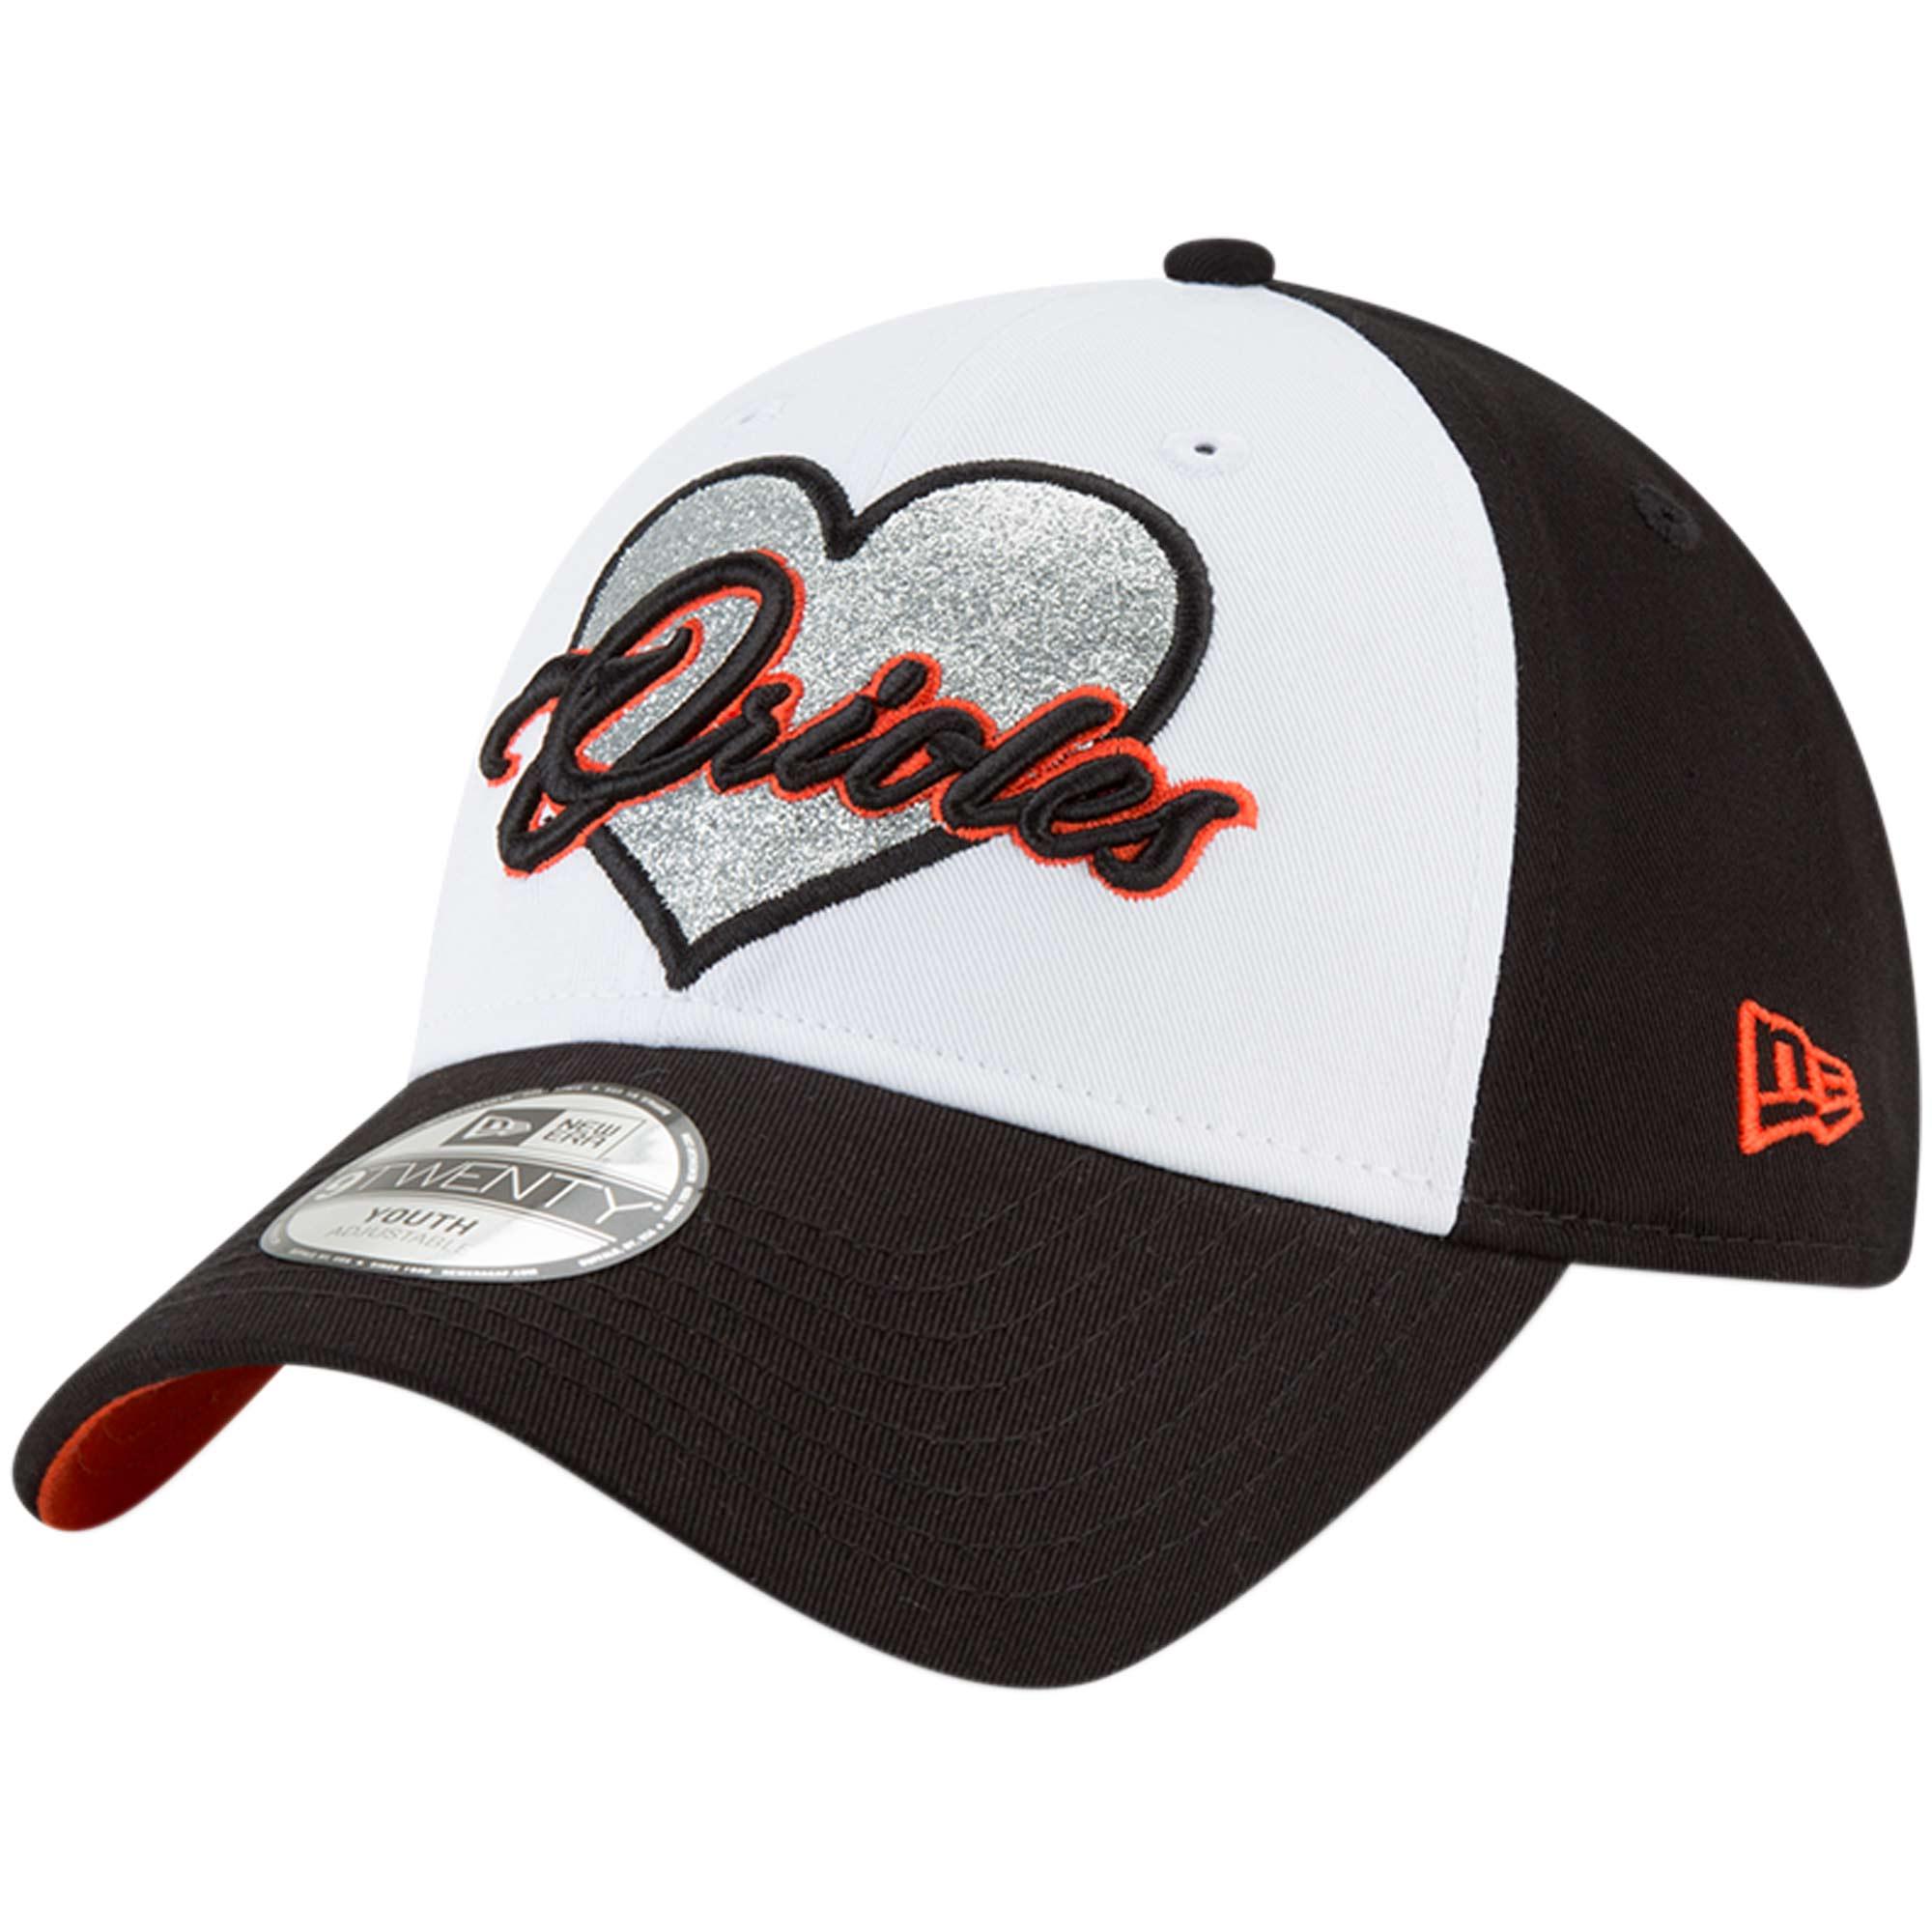 Baltimore Orioles New Era Girls Youth Sparkly Fan 9TWENTY Adjustable Hat - Black - OSFA